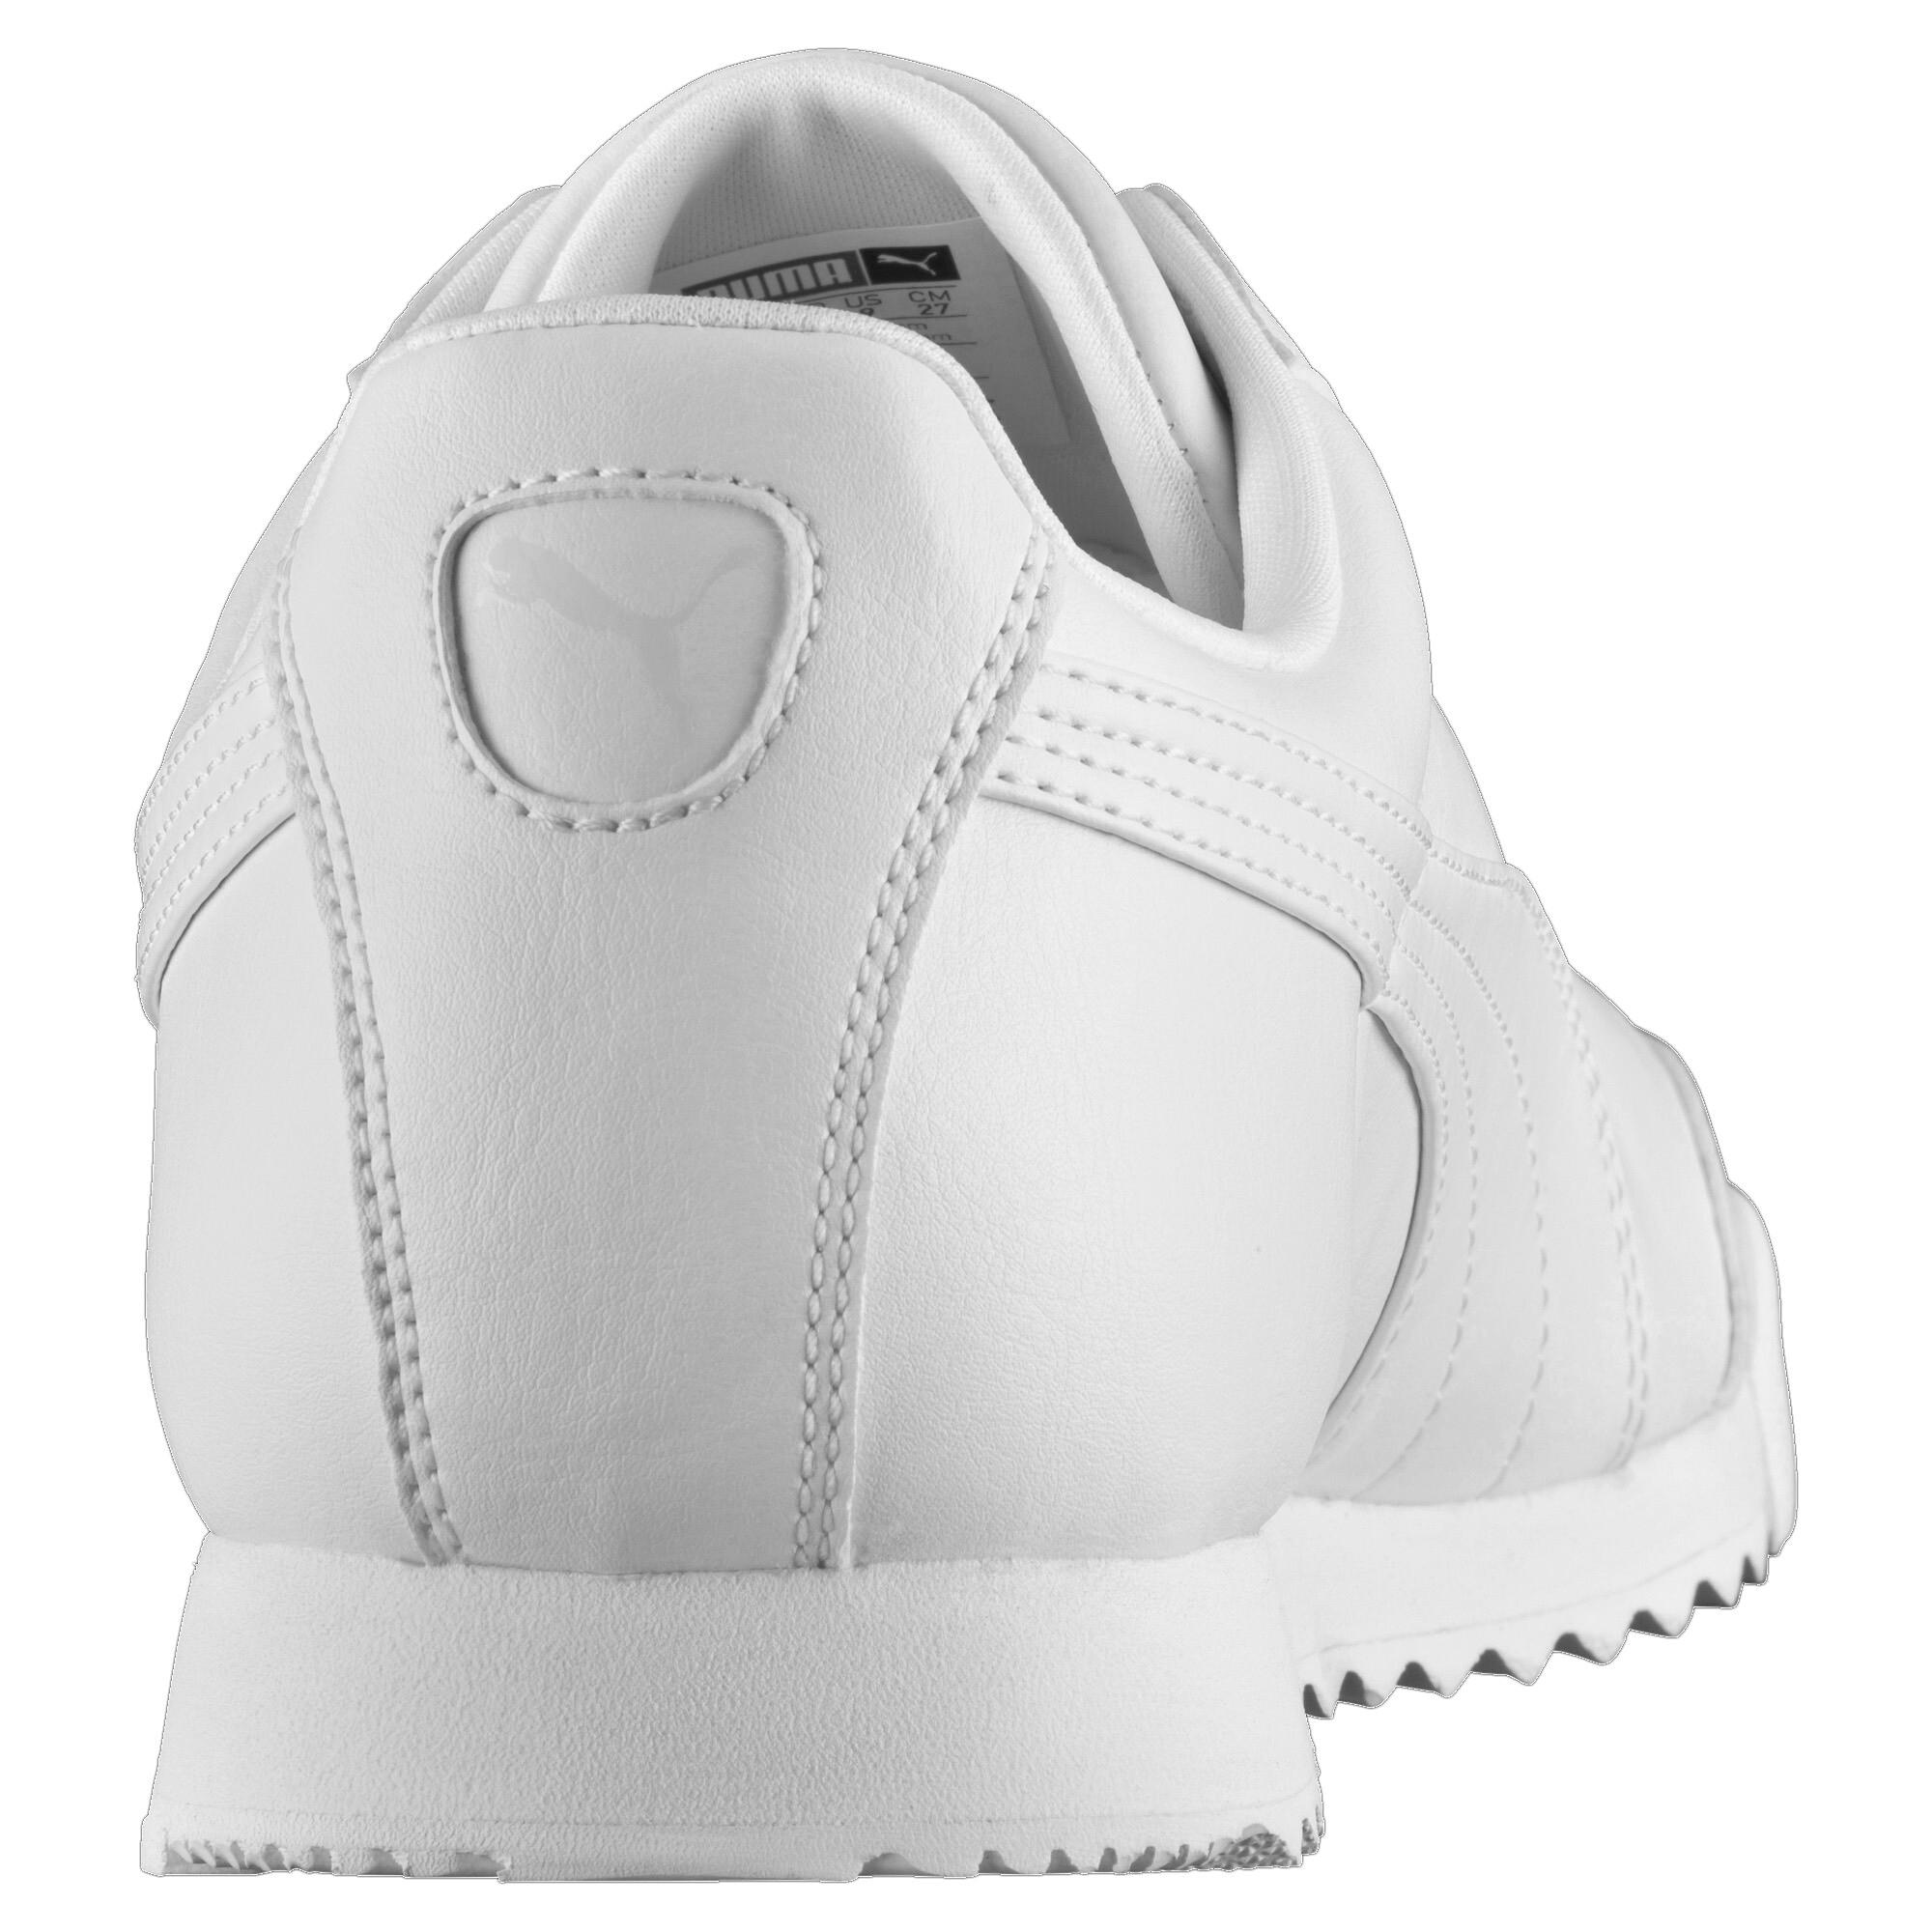 miniature 16 - Puma Men's Roma Basic Sneakers